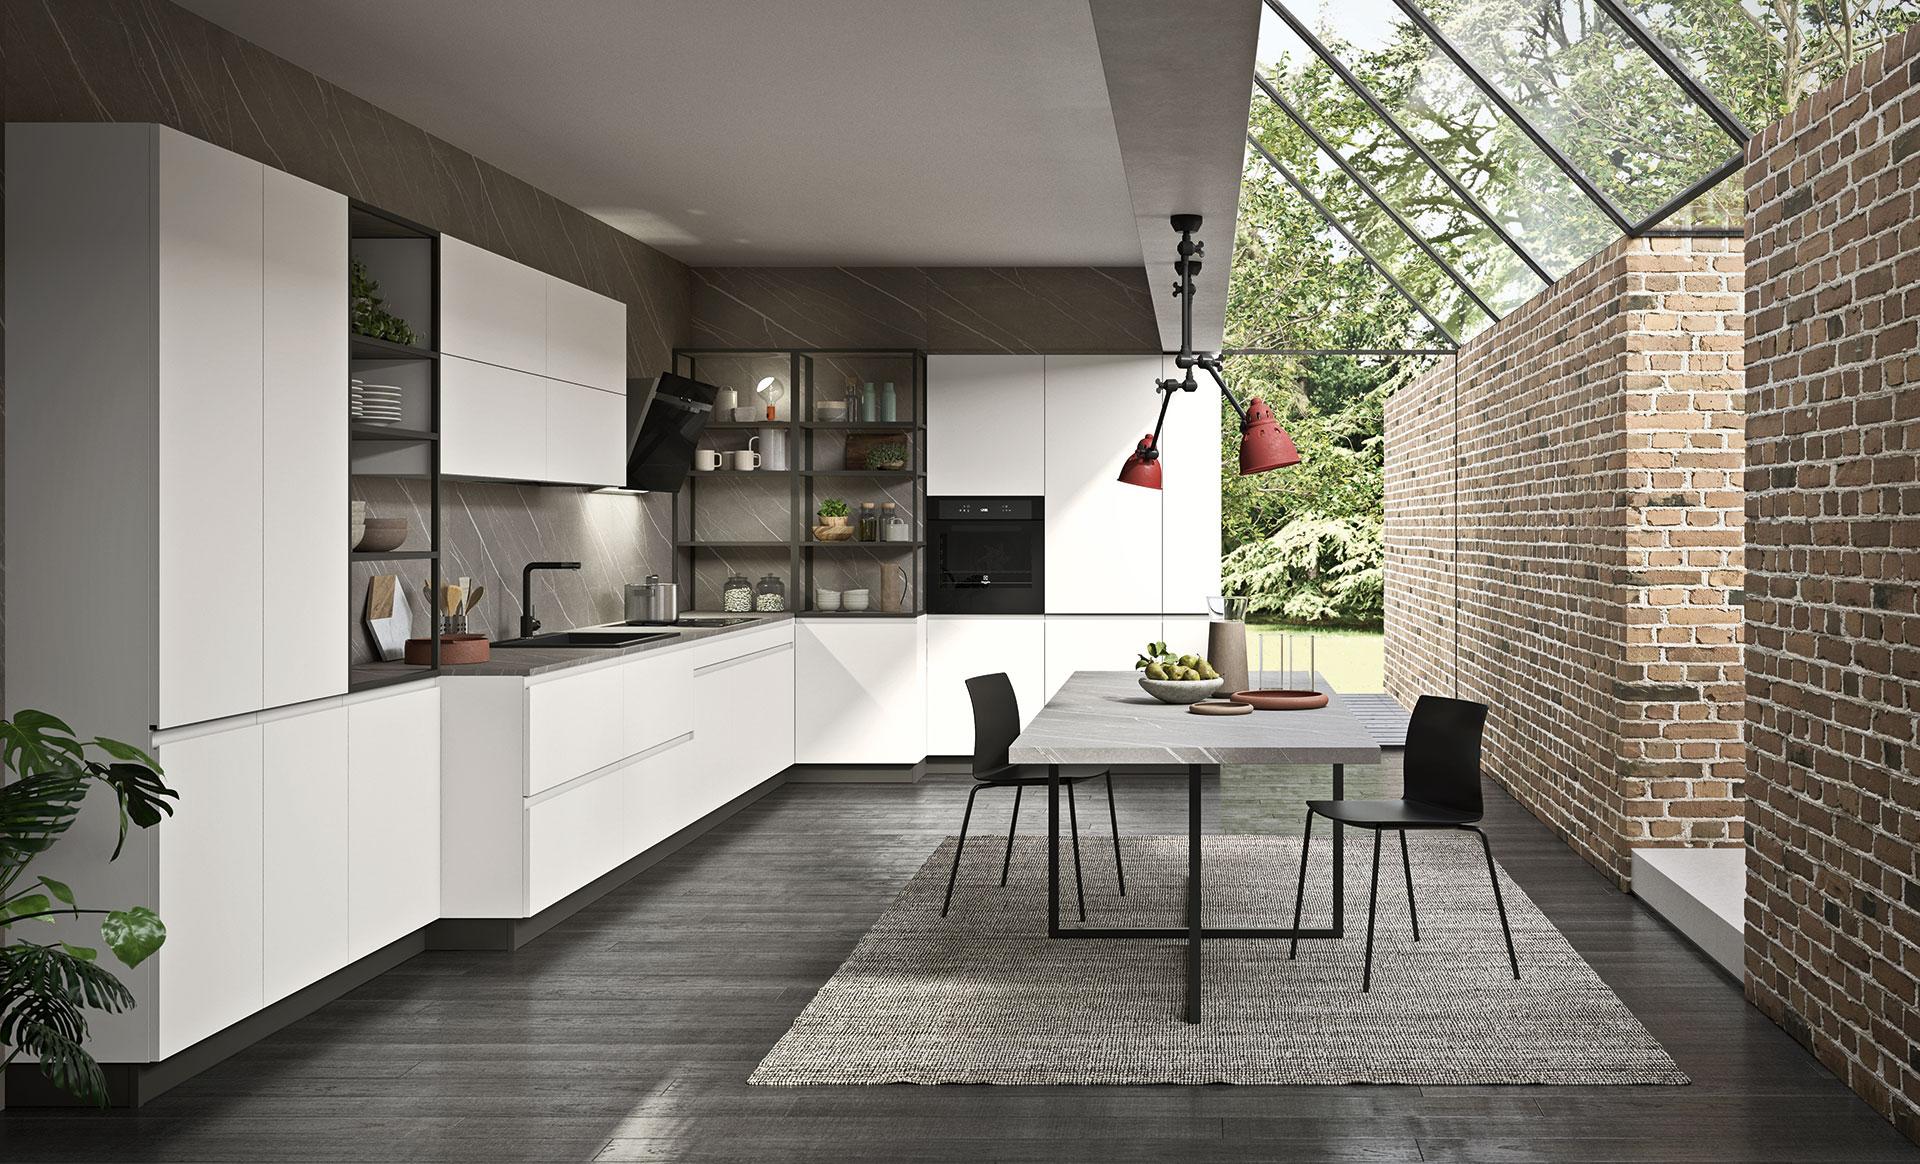 Un design originale per le cucine moderne antares - Cucine angolo cottura ...